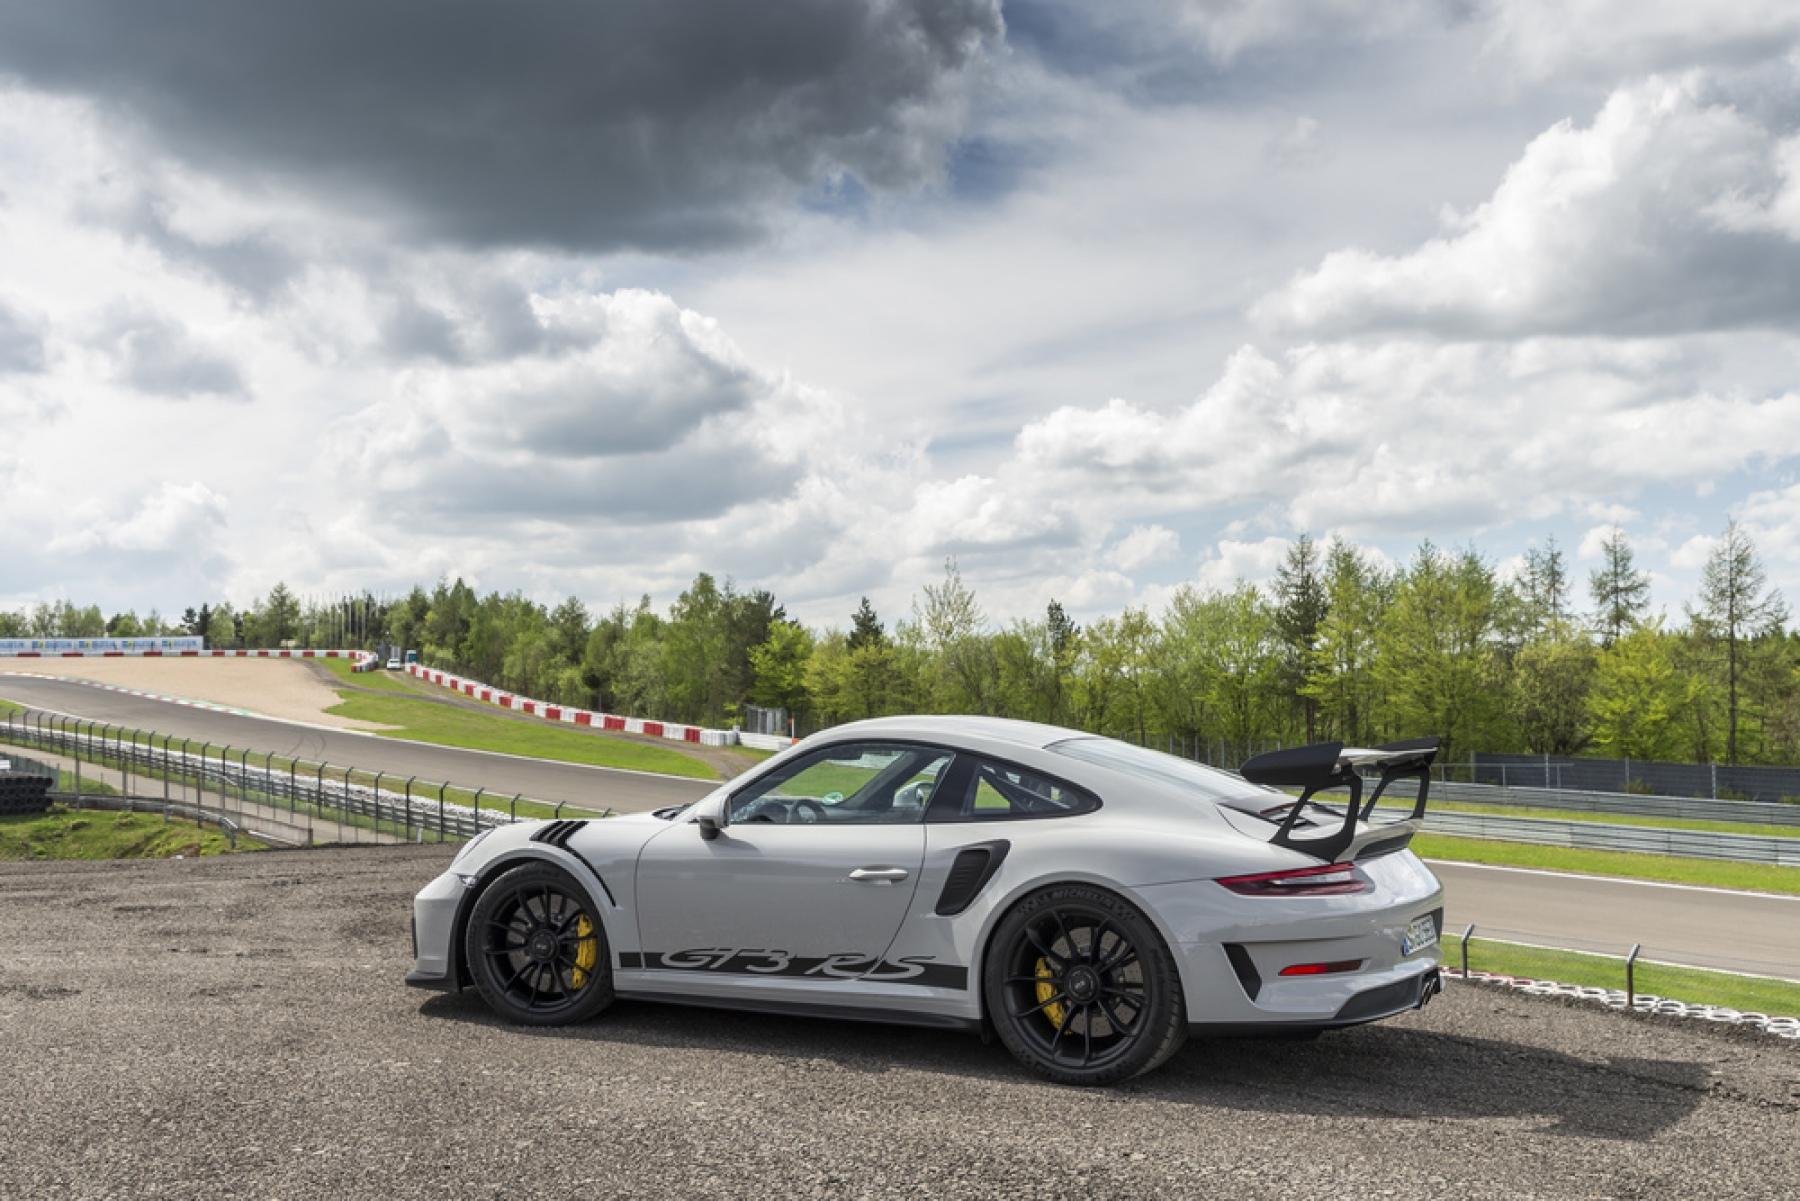 911 Gt3 Rs Crayon Porsche 911 Gt3 Rs